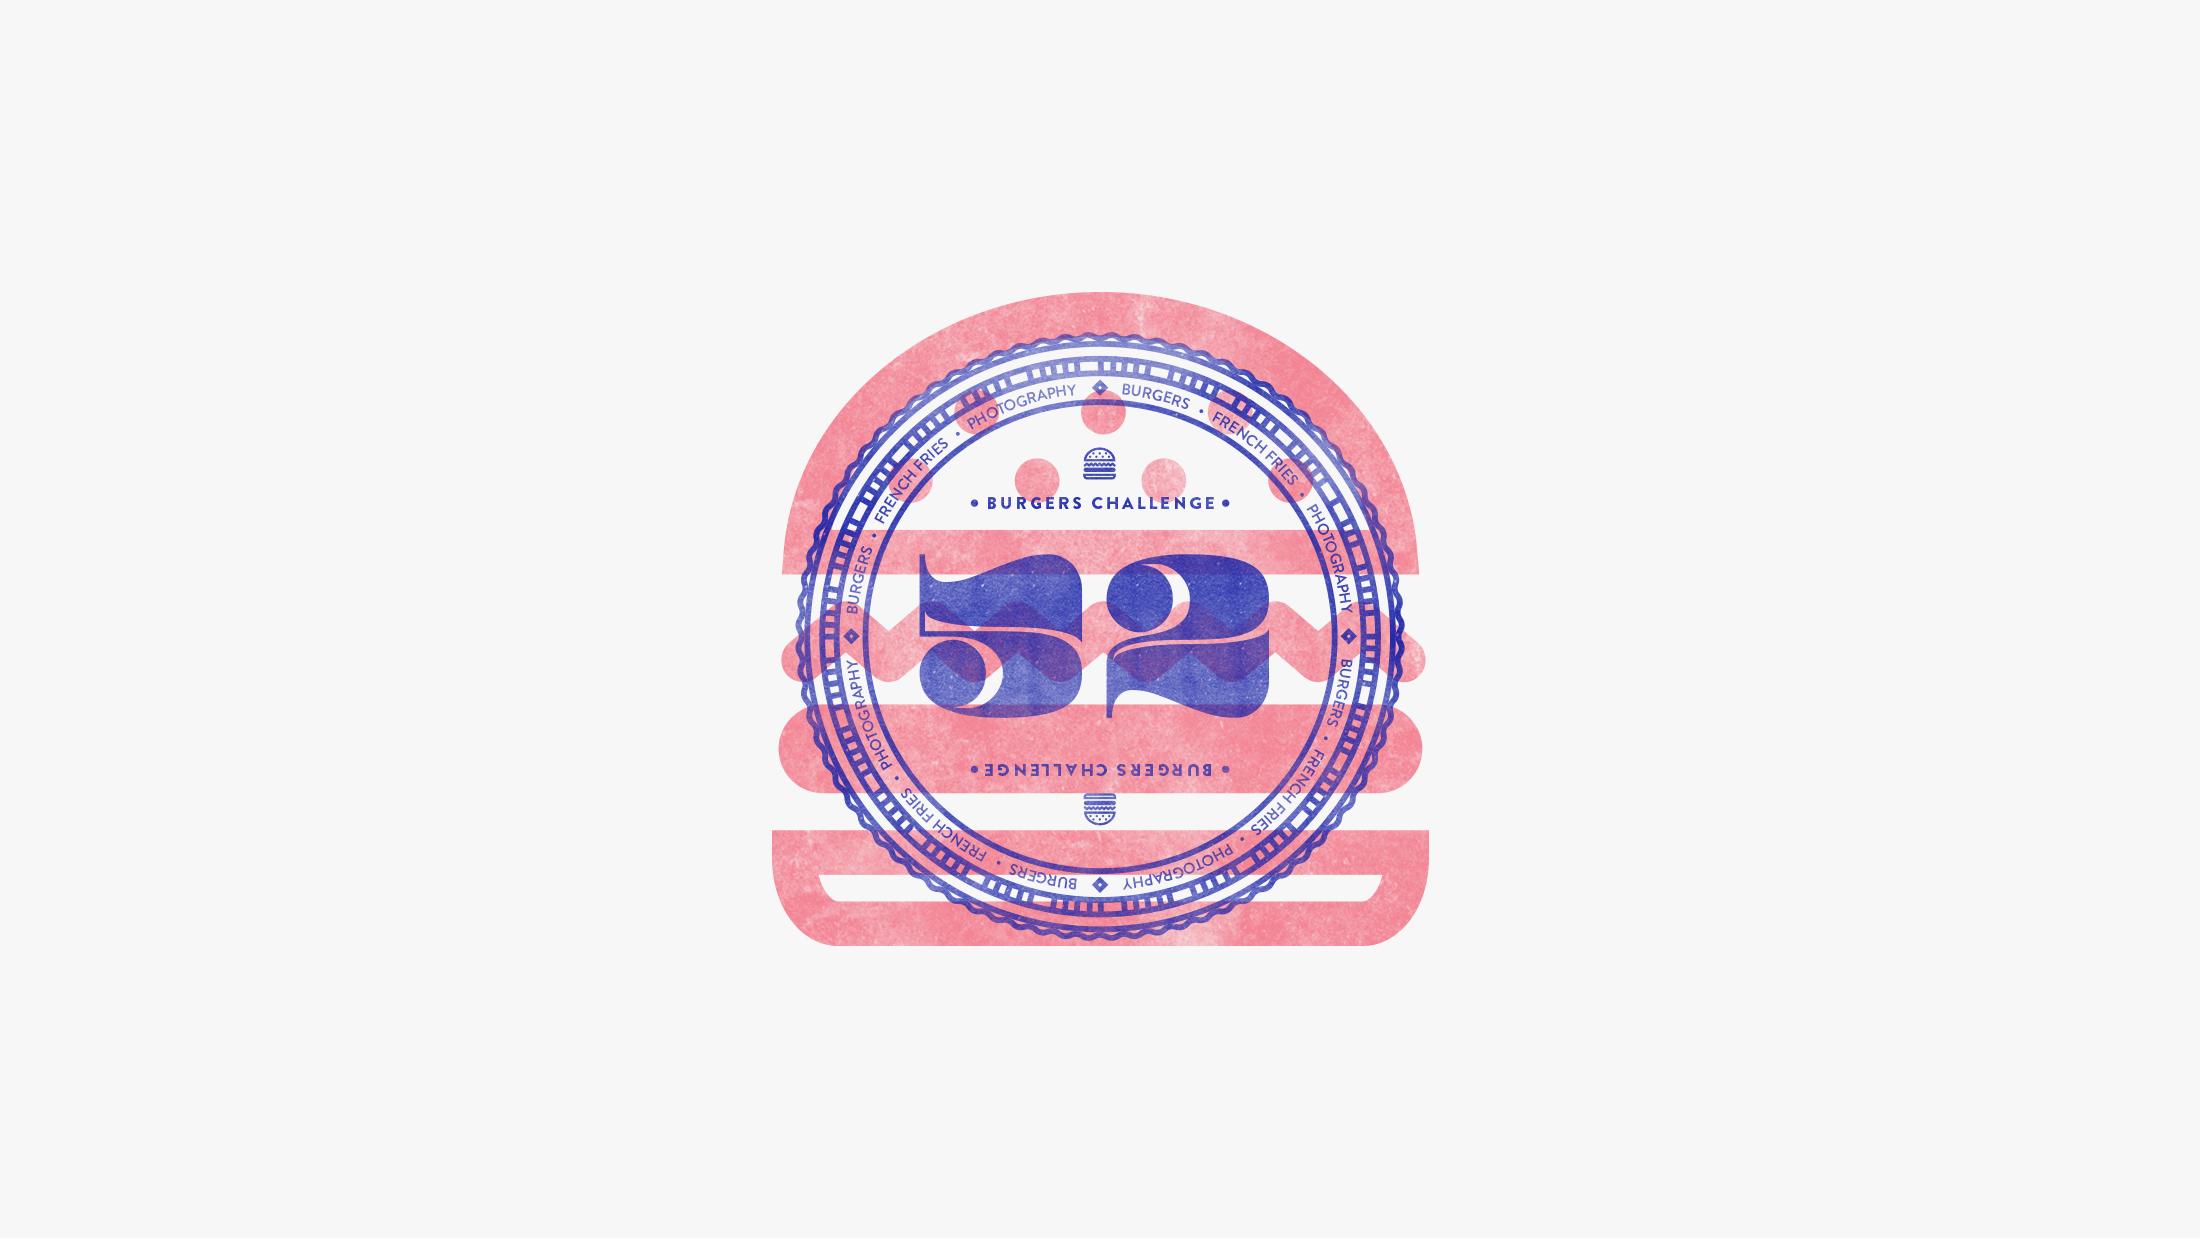 52Burger_1.jpg